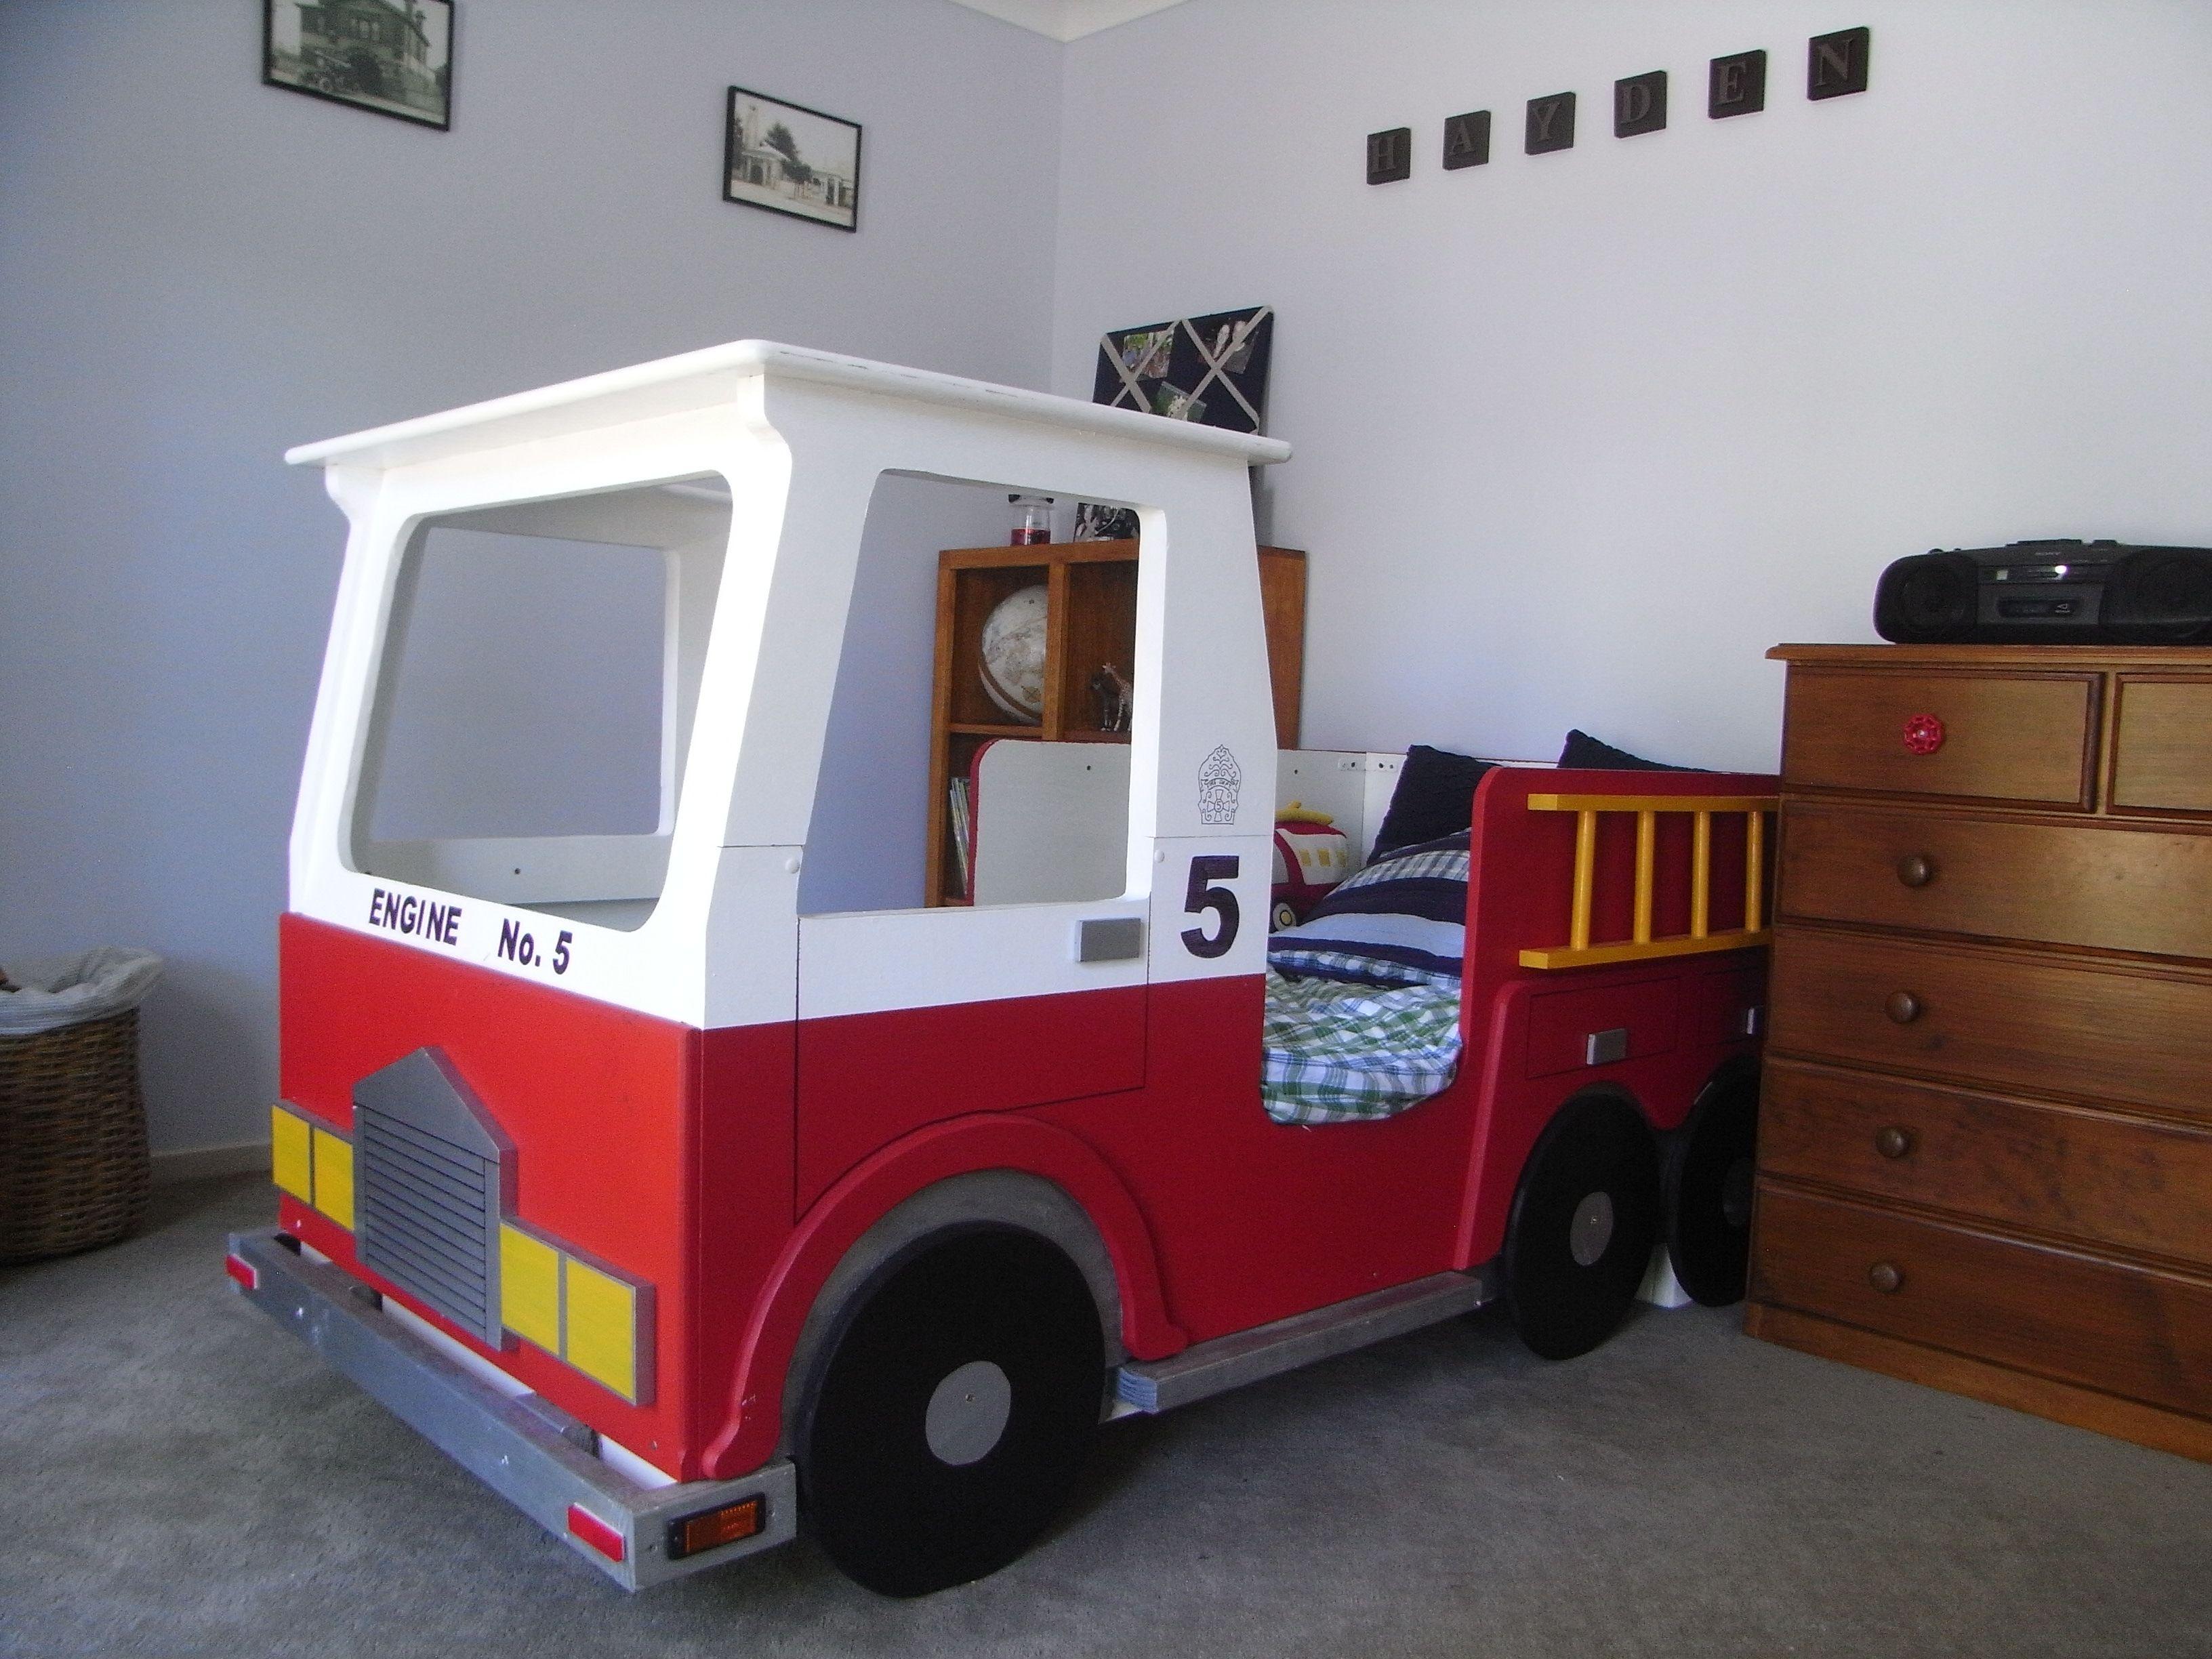 Fire Truck Bed Madeatthisplace Blogspot Com Au Firetruck Bed